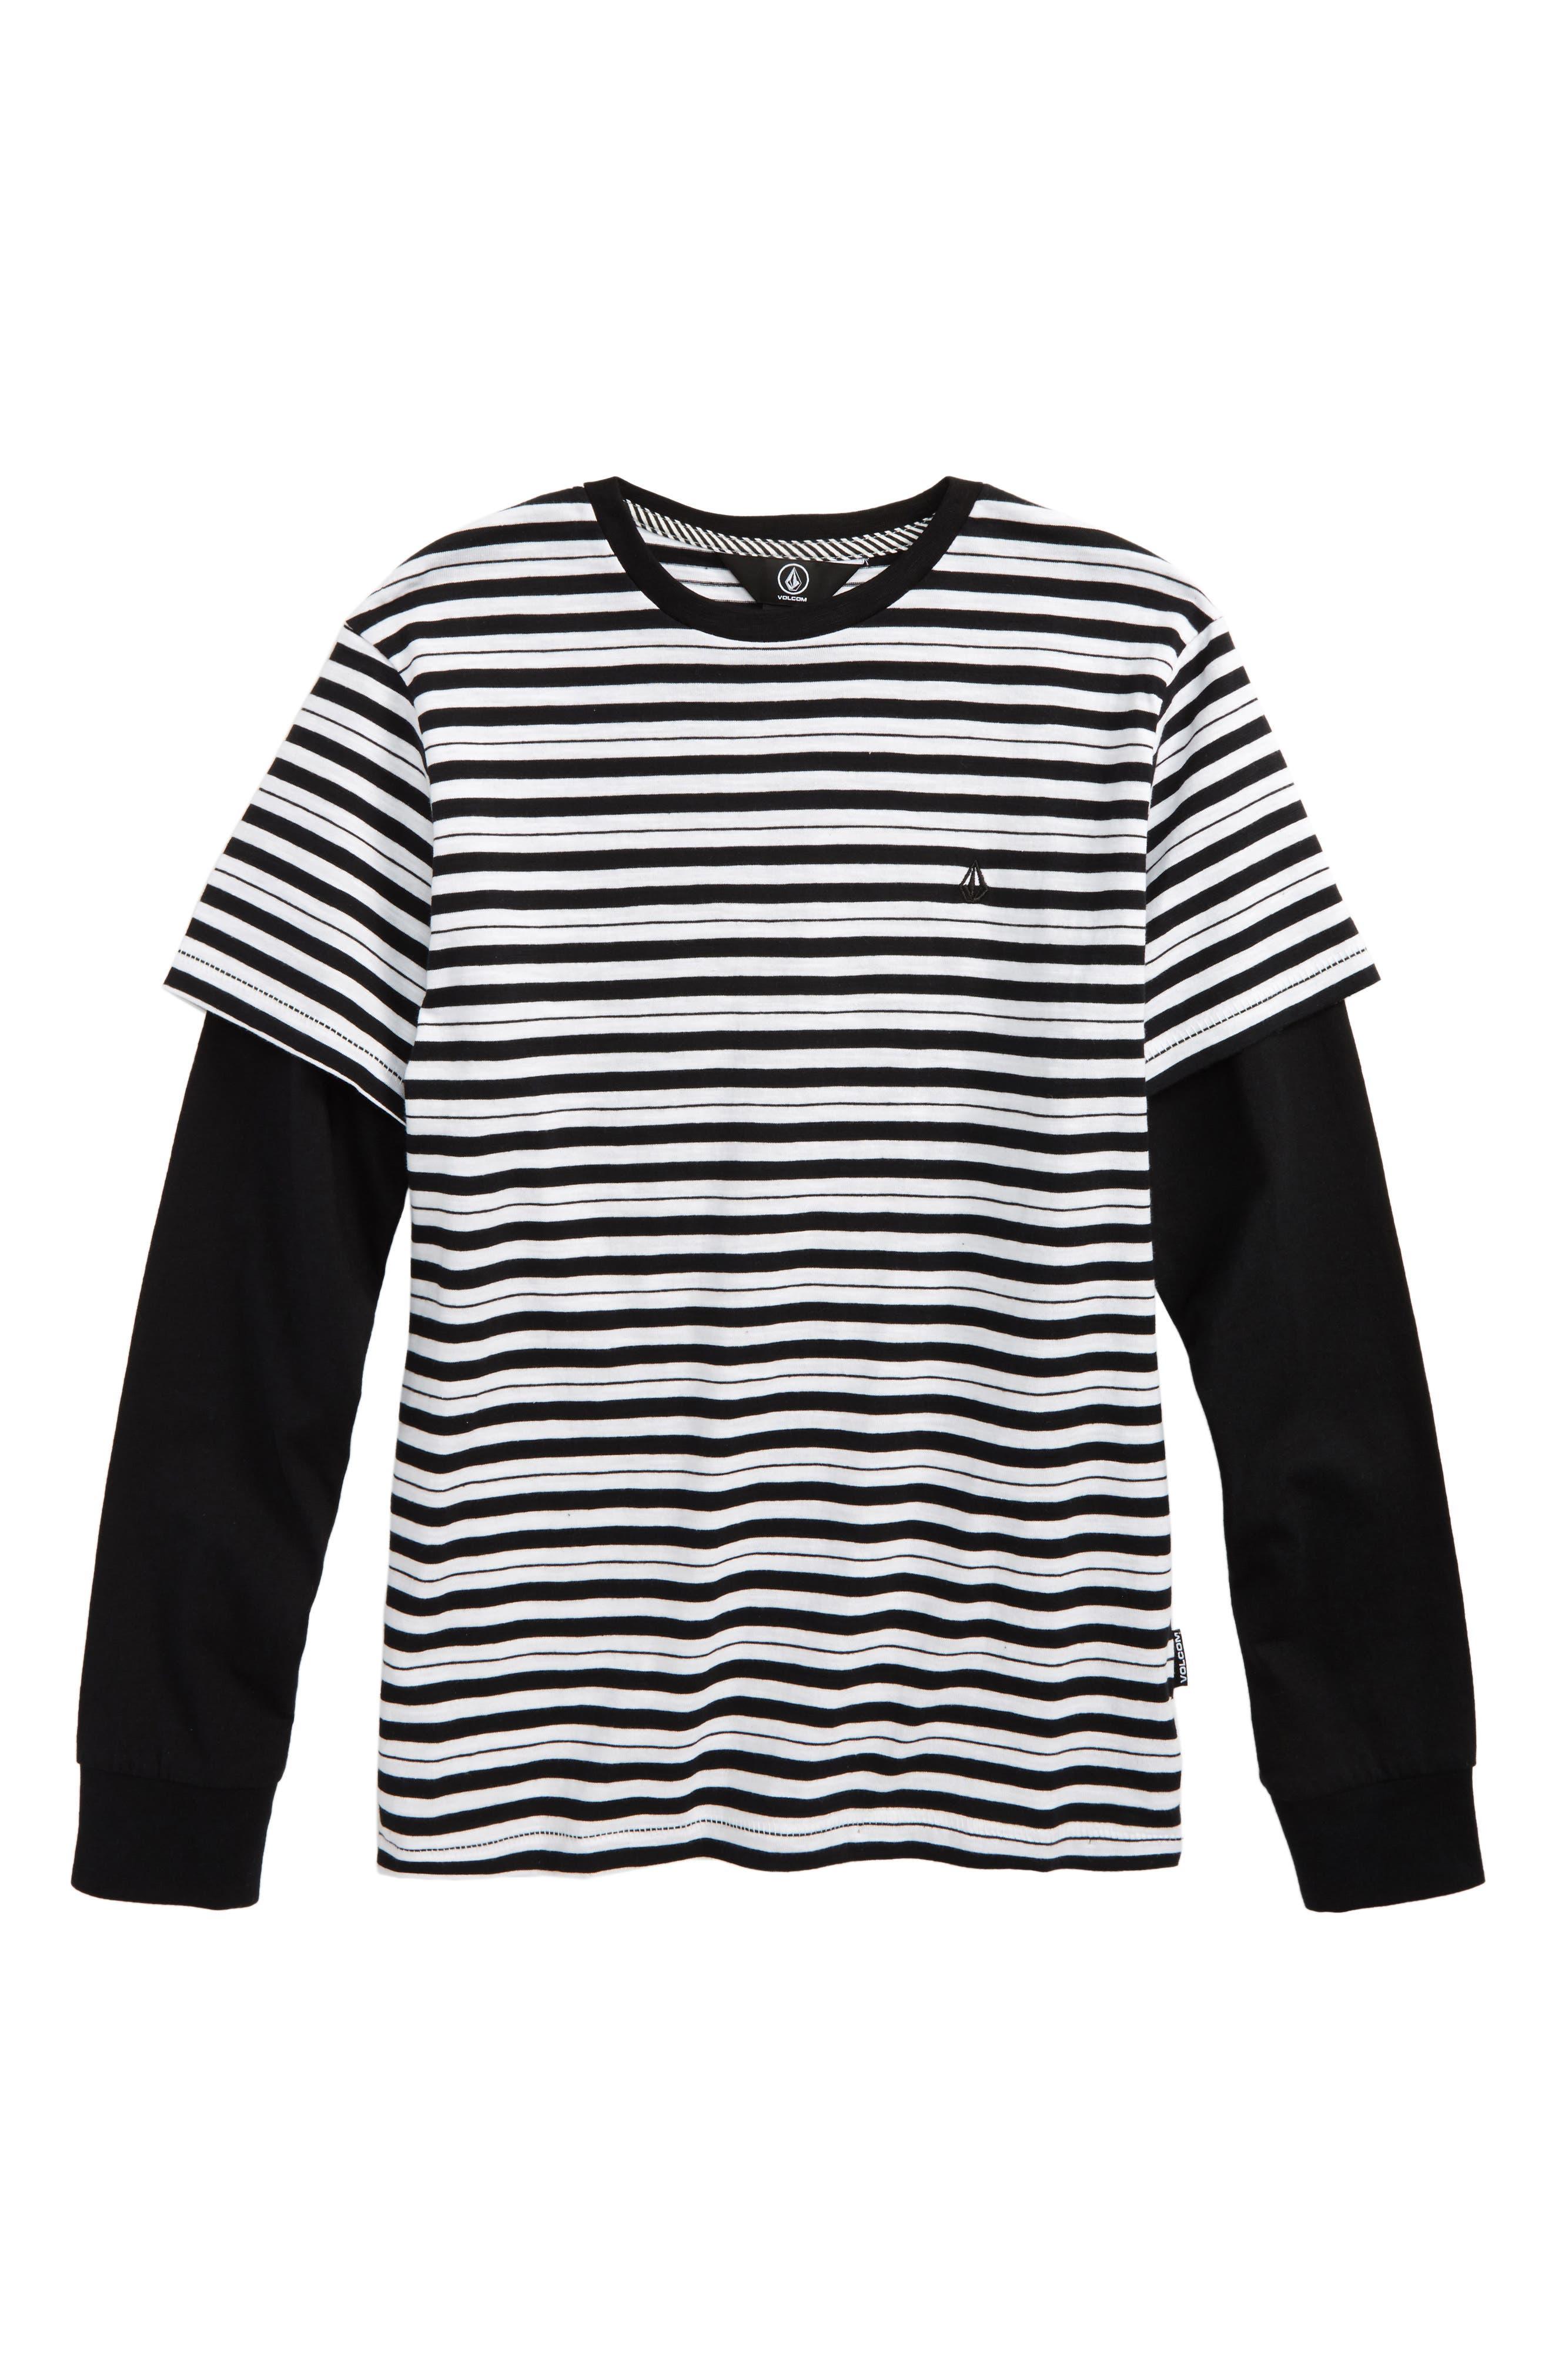 Volcom Impact Twofer Layered T-Shirt (Big Boys)